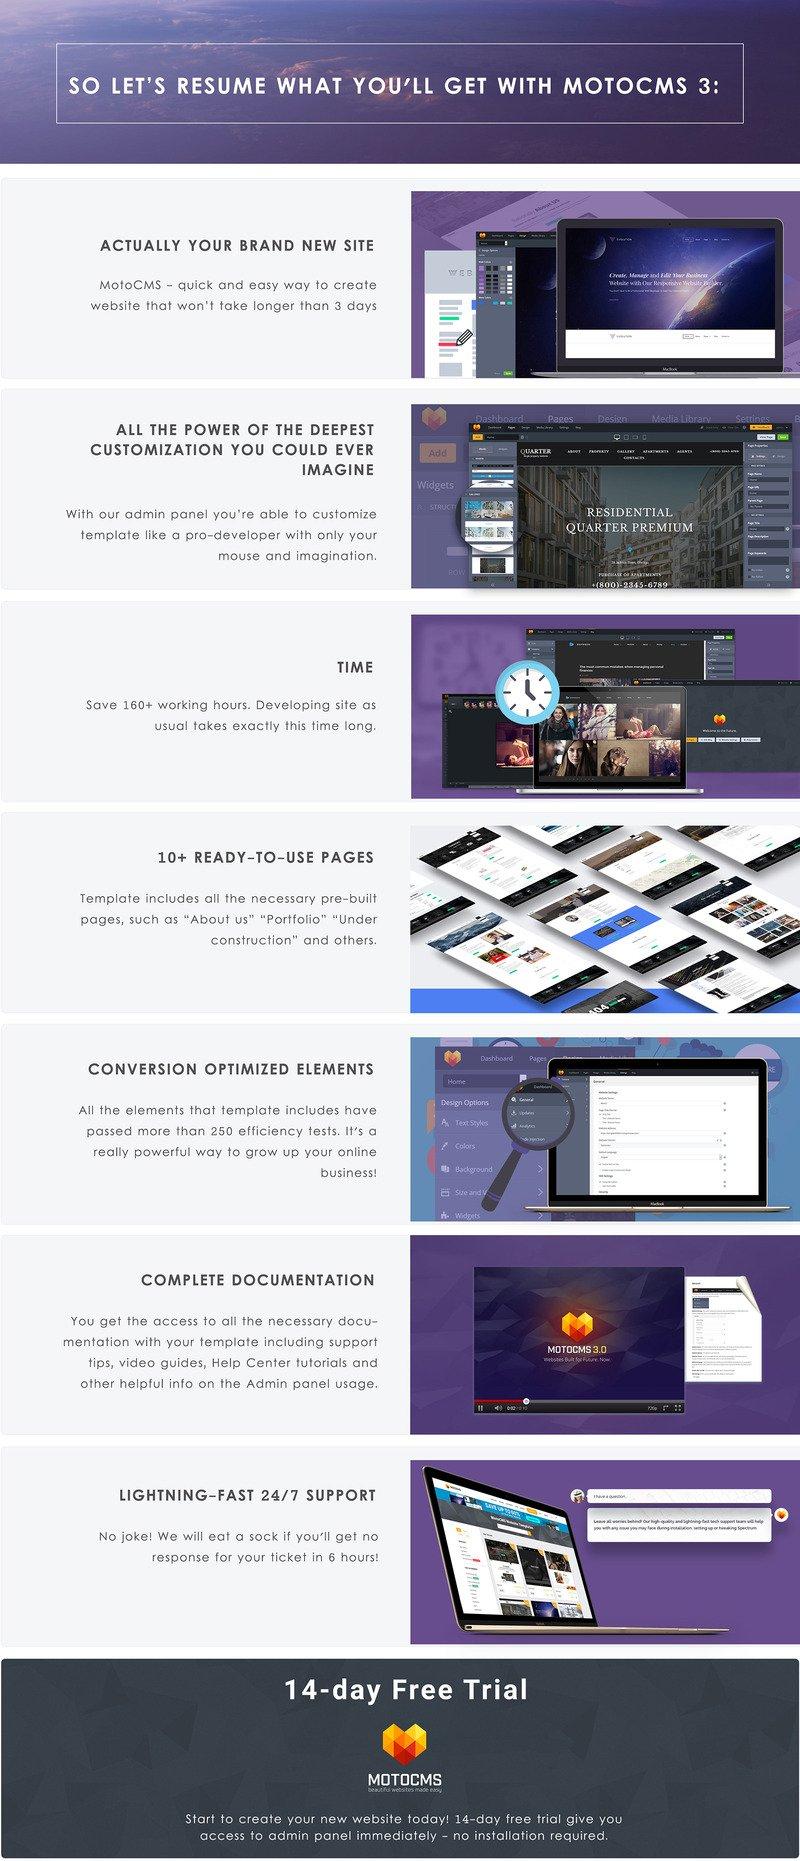 Liquiditt - Business Consulting Moto CMS 3 Template - Features Image 6